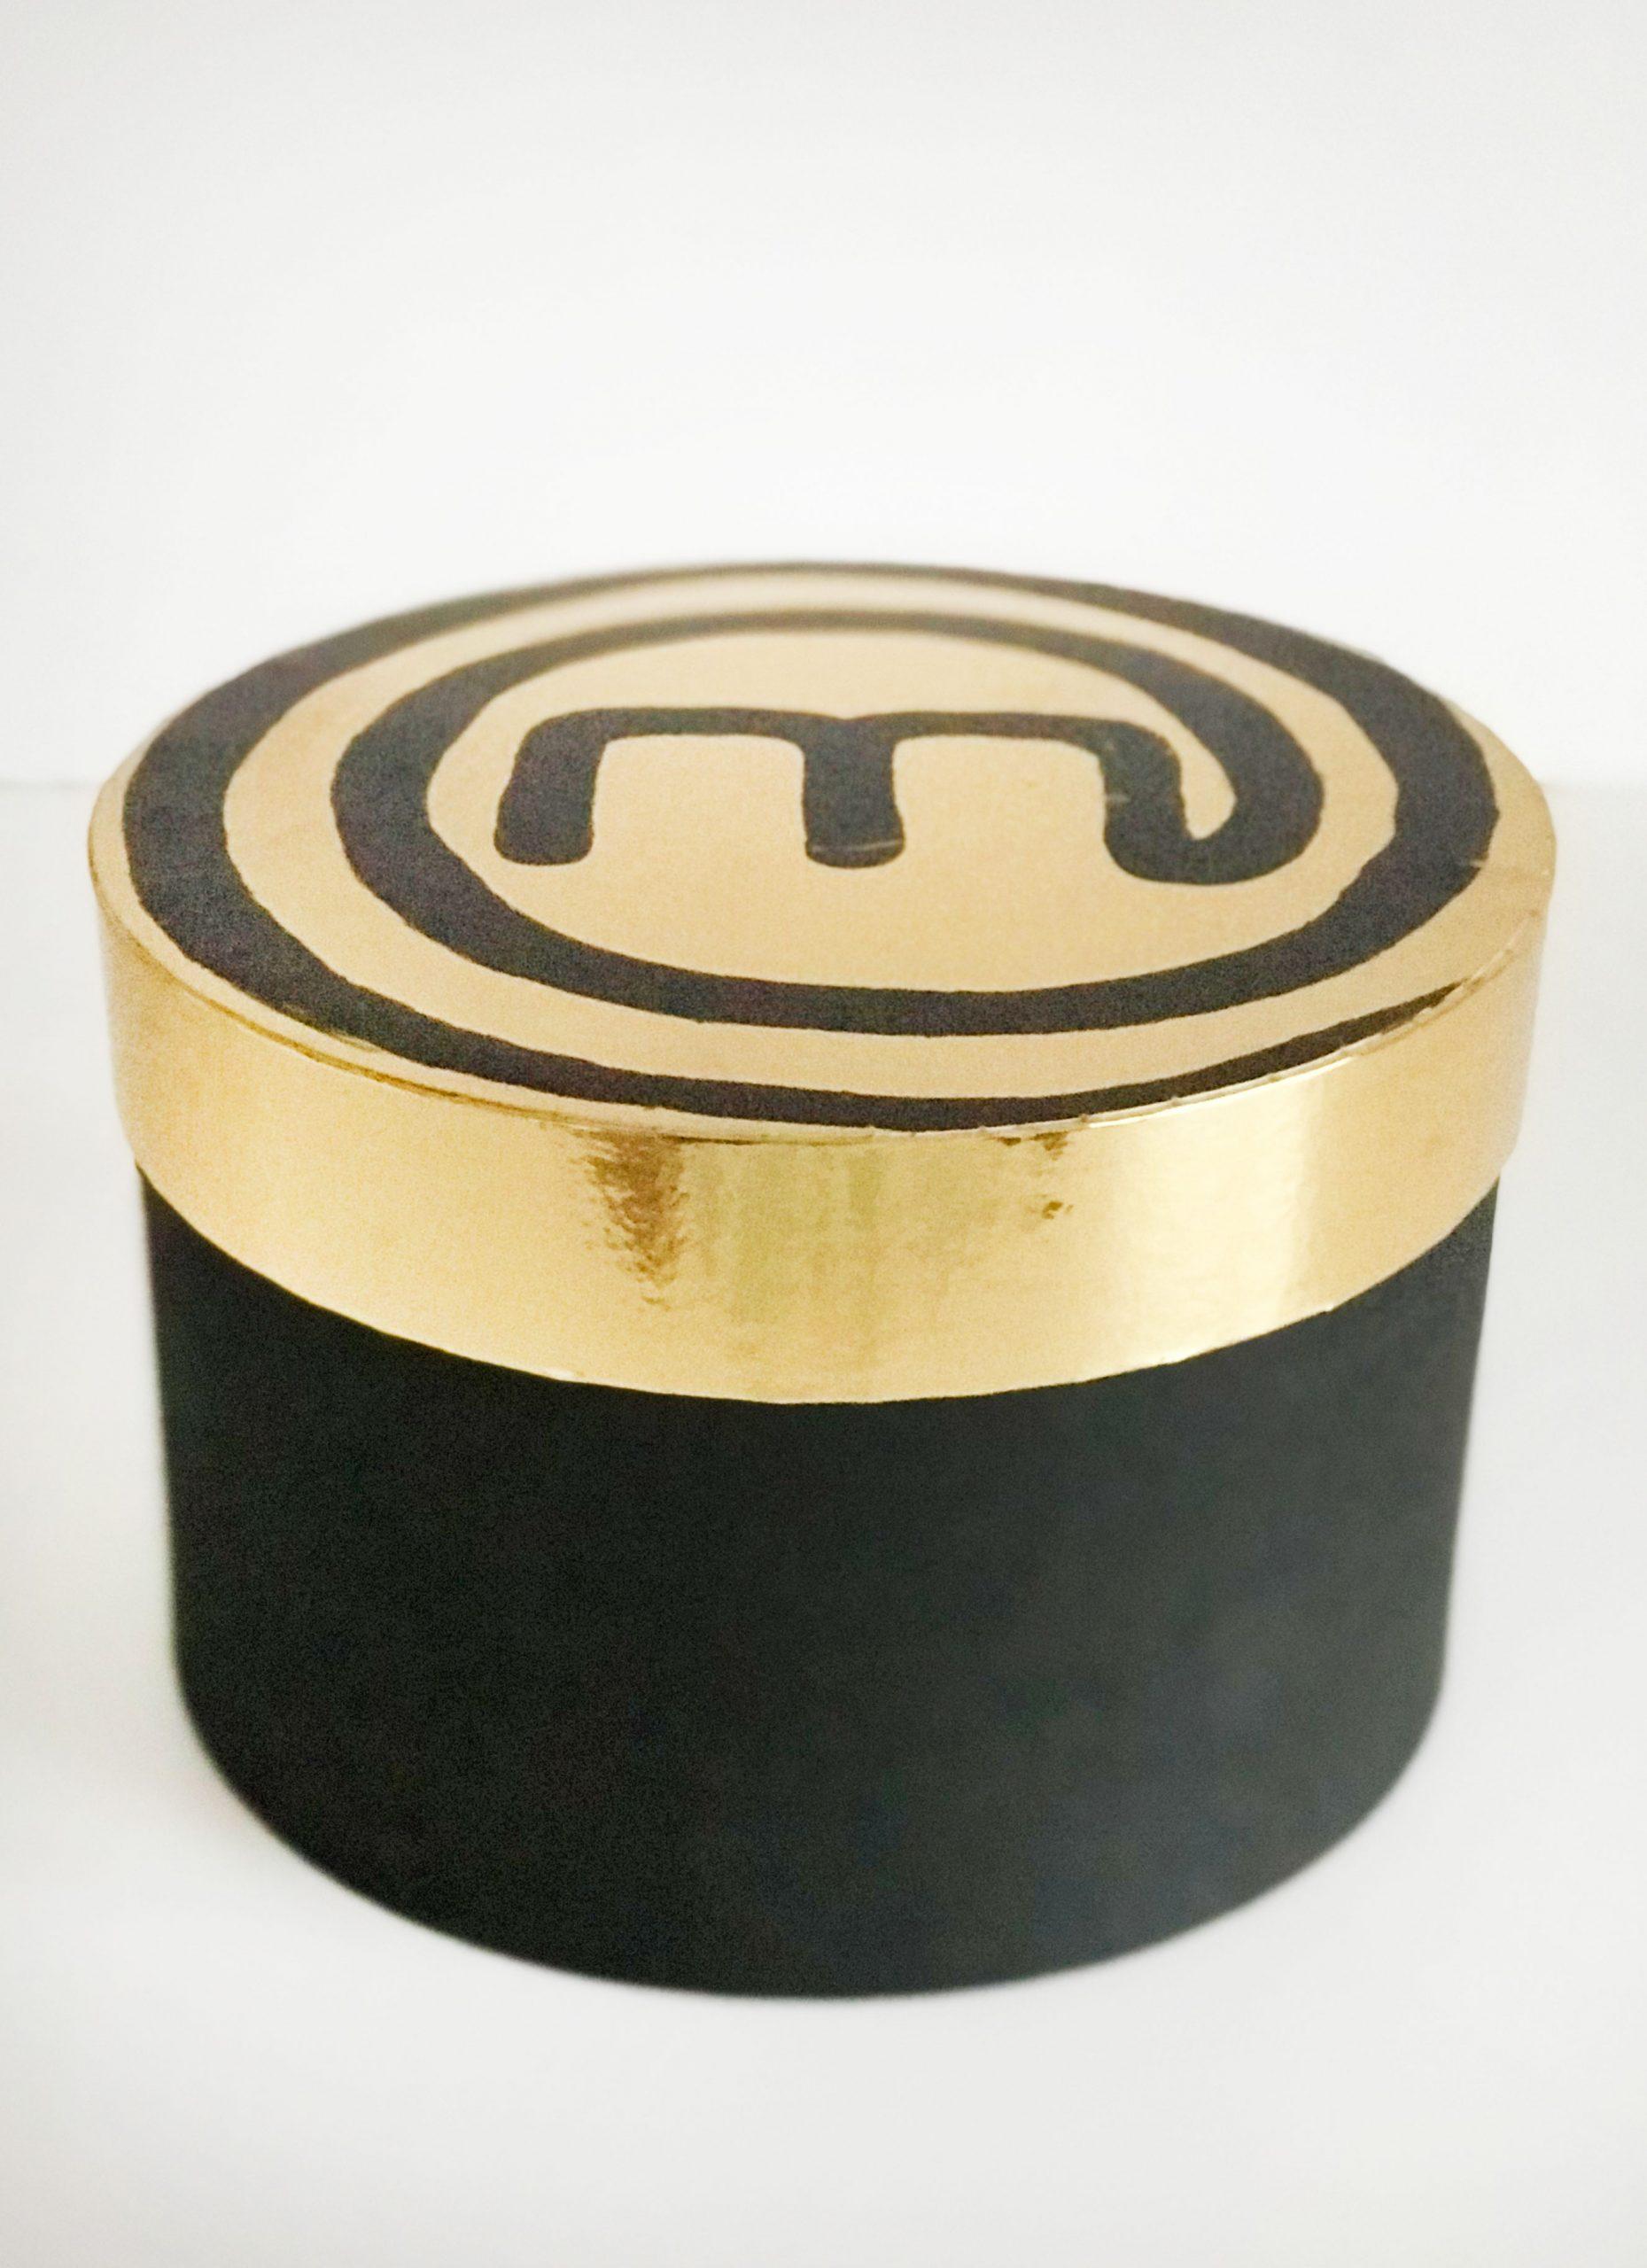 Masterchef pin box